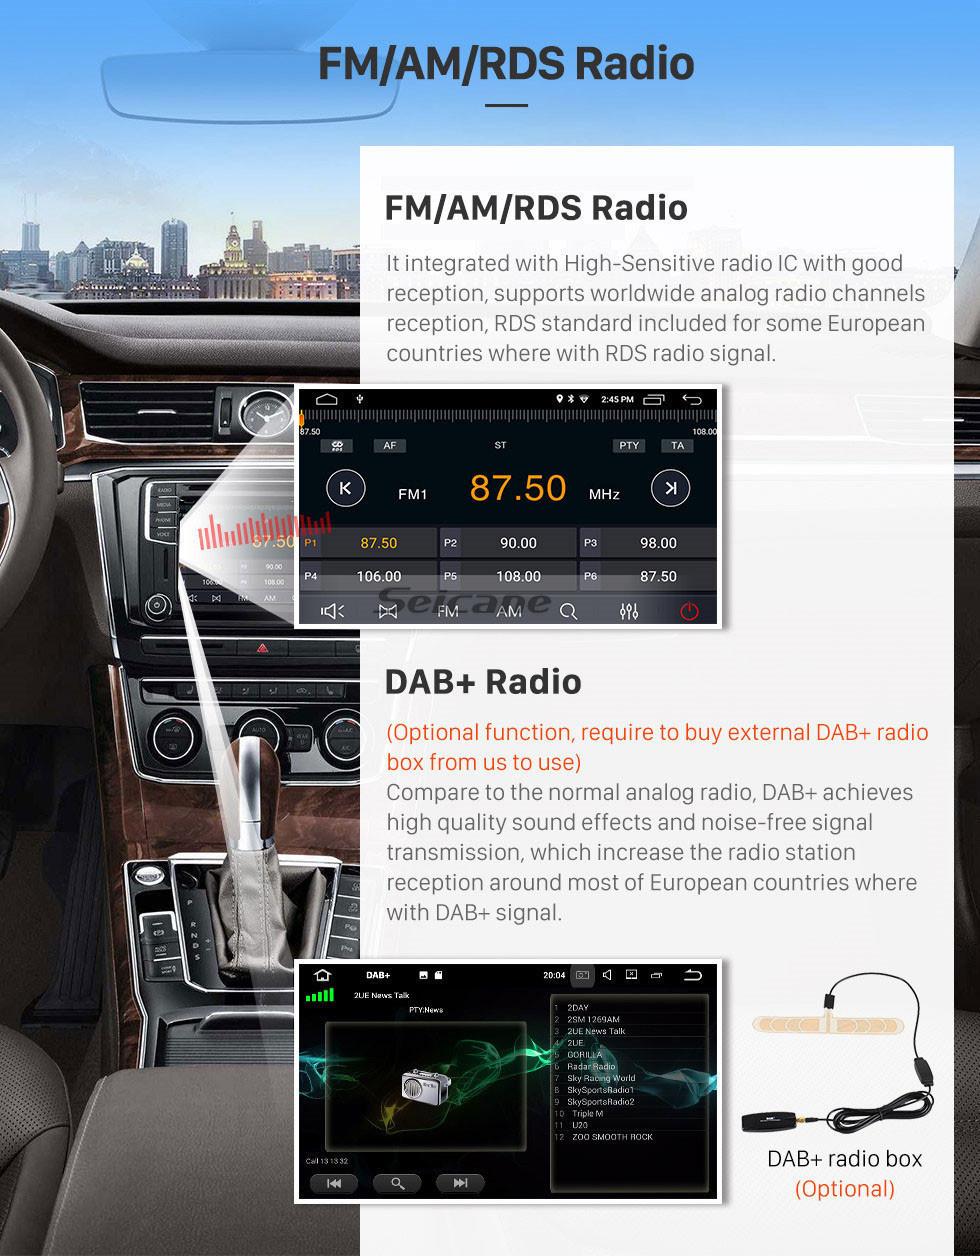 Seicane 2 Din Android 10.0 Unidad principal de radio para 2009 2010 2011 GMC Chevy Chevrolet Express VAN Traverse con HD 1024 * 600 pantalla táctil GPS Sat Nav Reproductor de DVD Sistema de audio WiFi Bluetooth Mirror Link 1080P Video